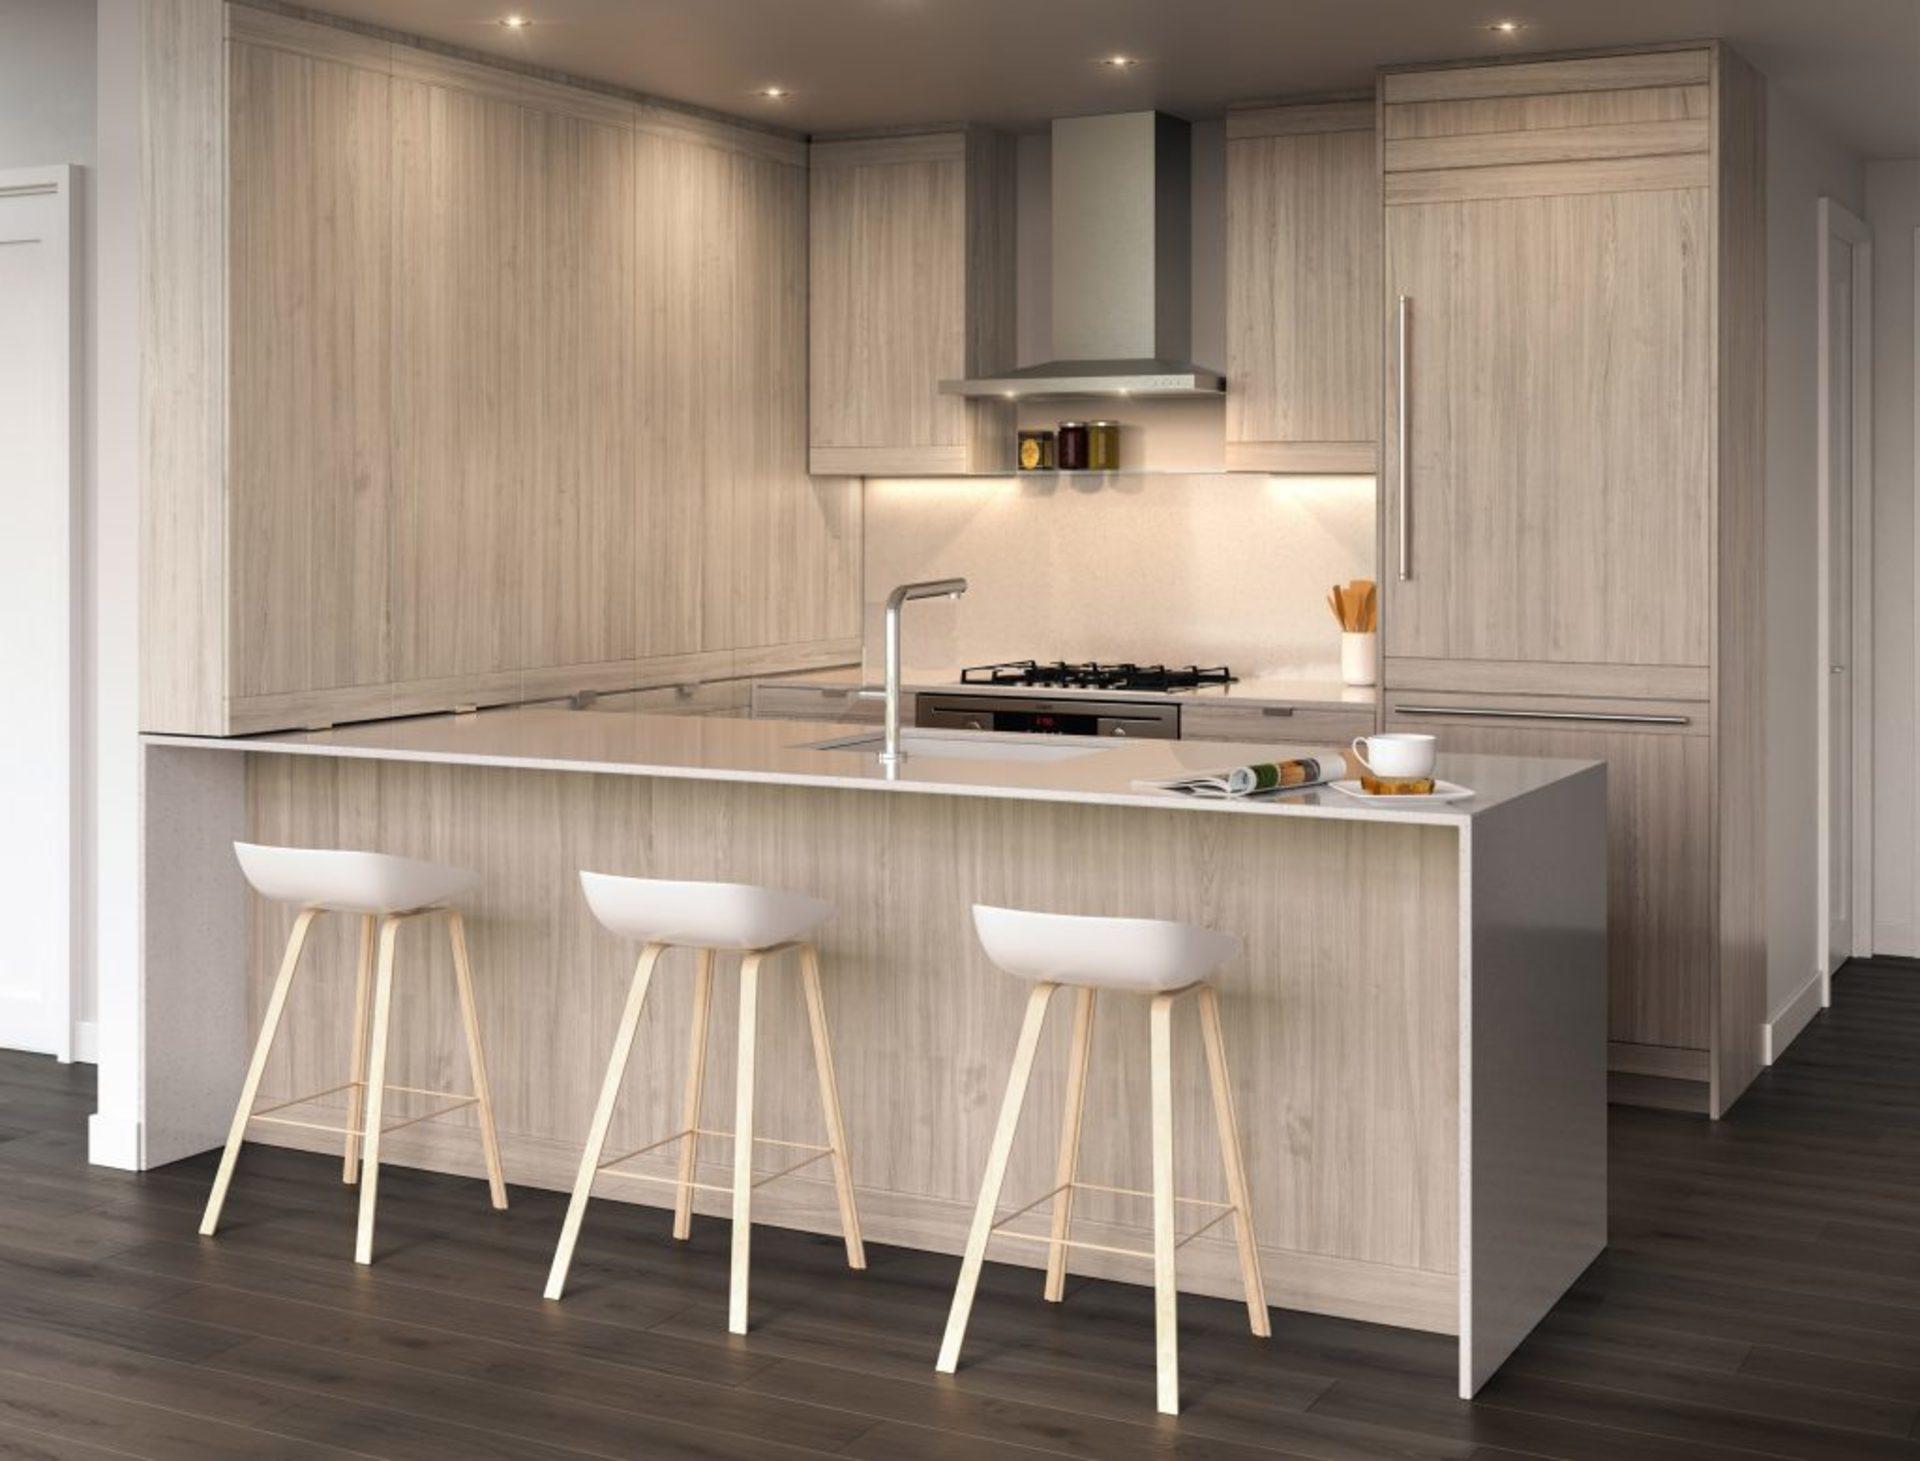 lumina-kitchen-cabinetry at Waterfall  -  Lumina (2425 Beta Avenue, Brentwood Park, Burnaby North)